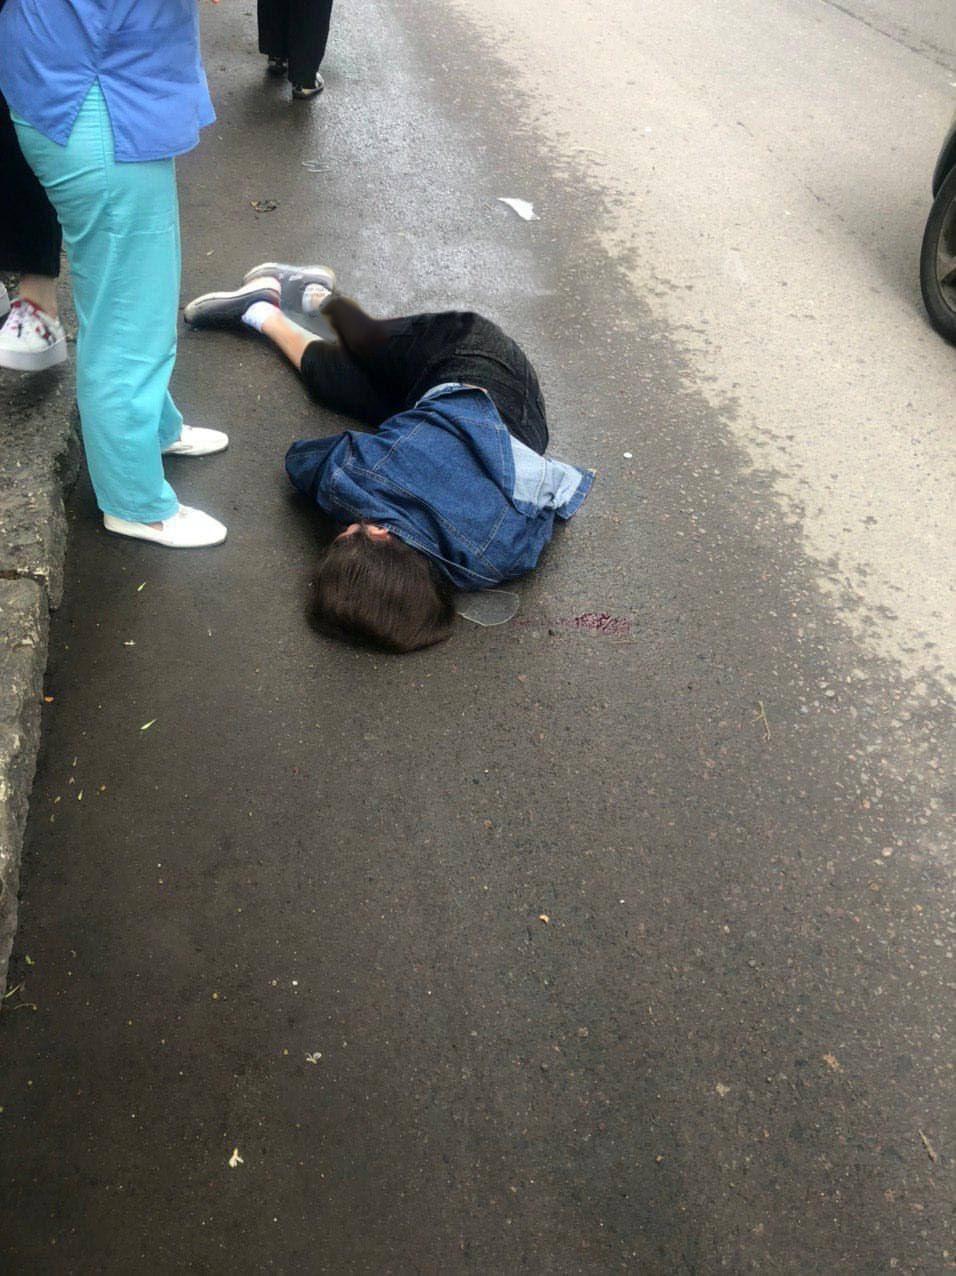 Шла по пешеходному переходу: на Молдаванке сбили 15-летнюю девушку